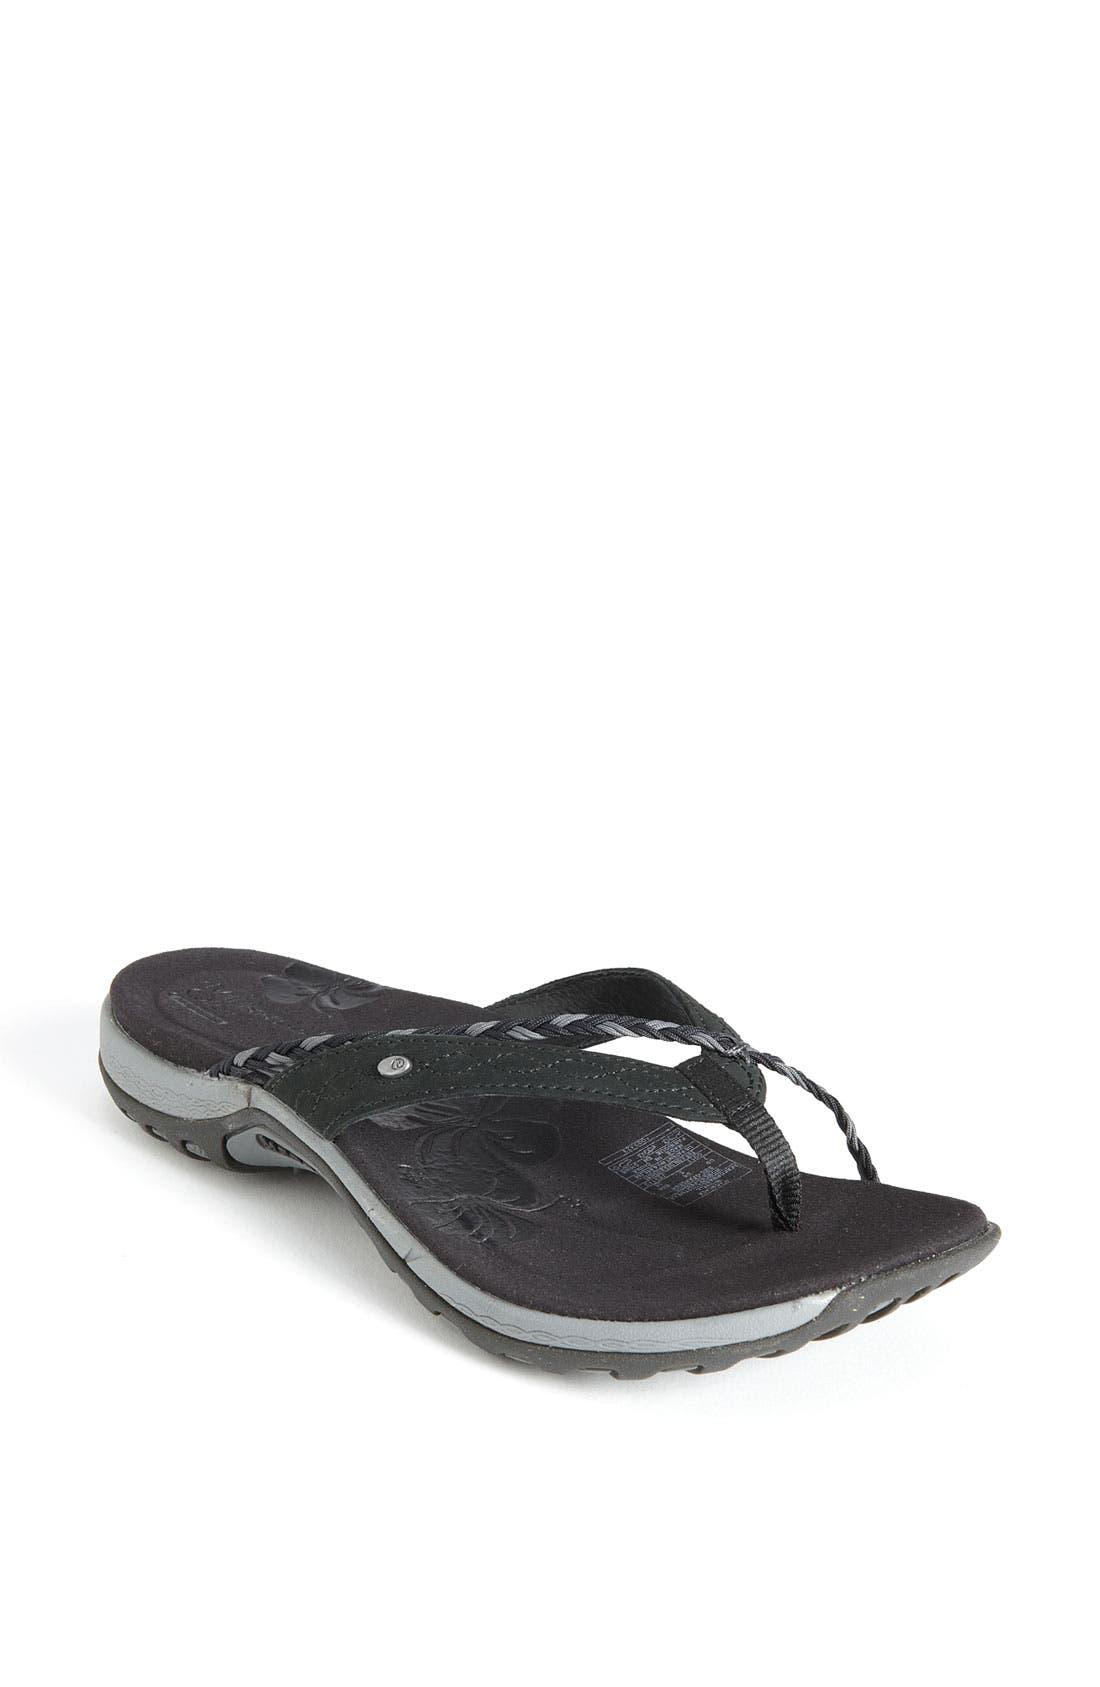 Alternate Image 1 Selected - Merrell 'Lilac' Sandal